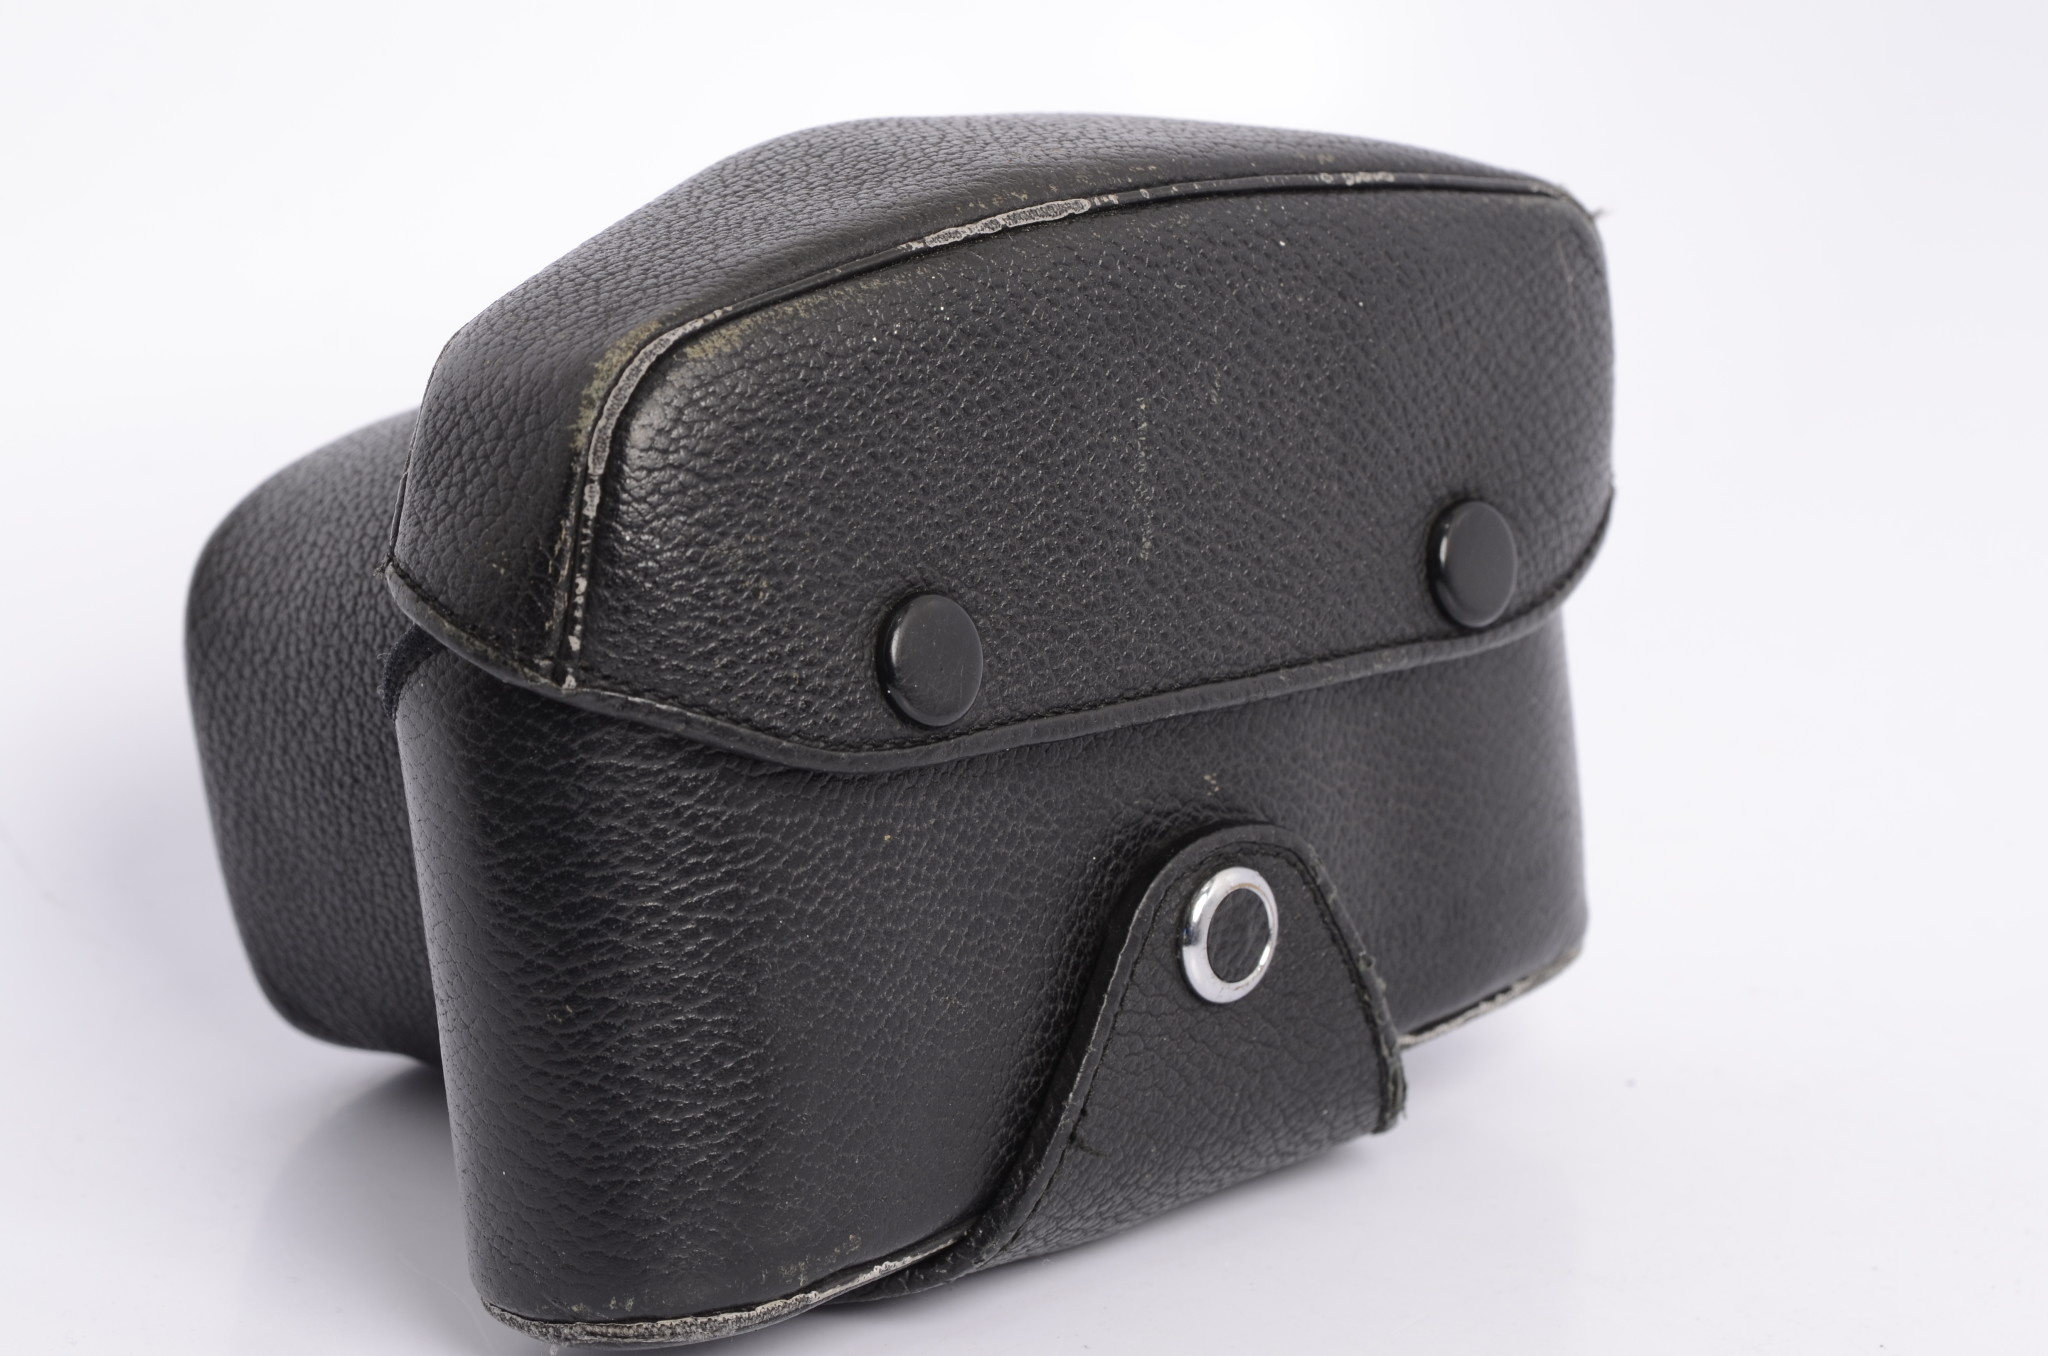 Pentax Honeywell Pentax K1000 Black Leather Eveready Case